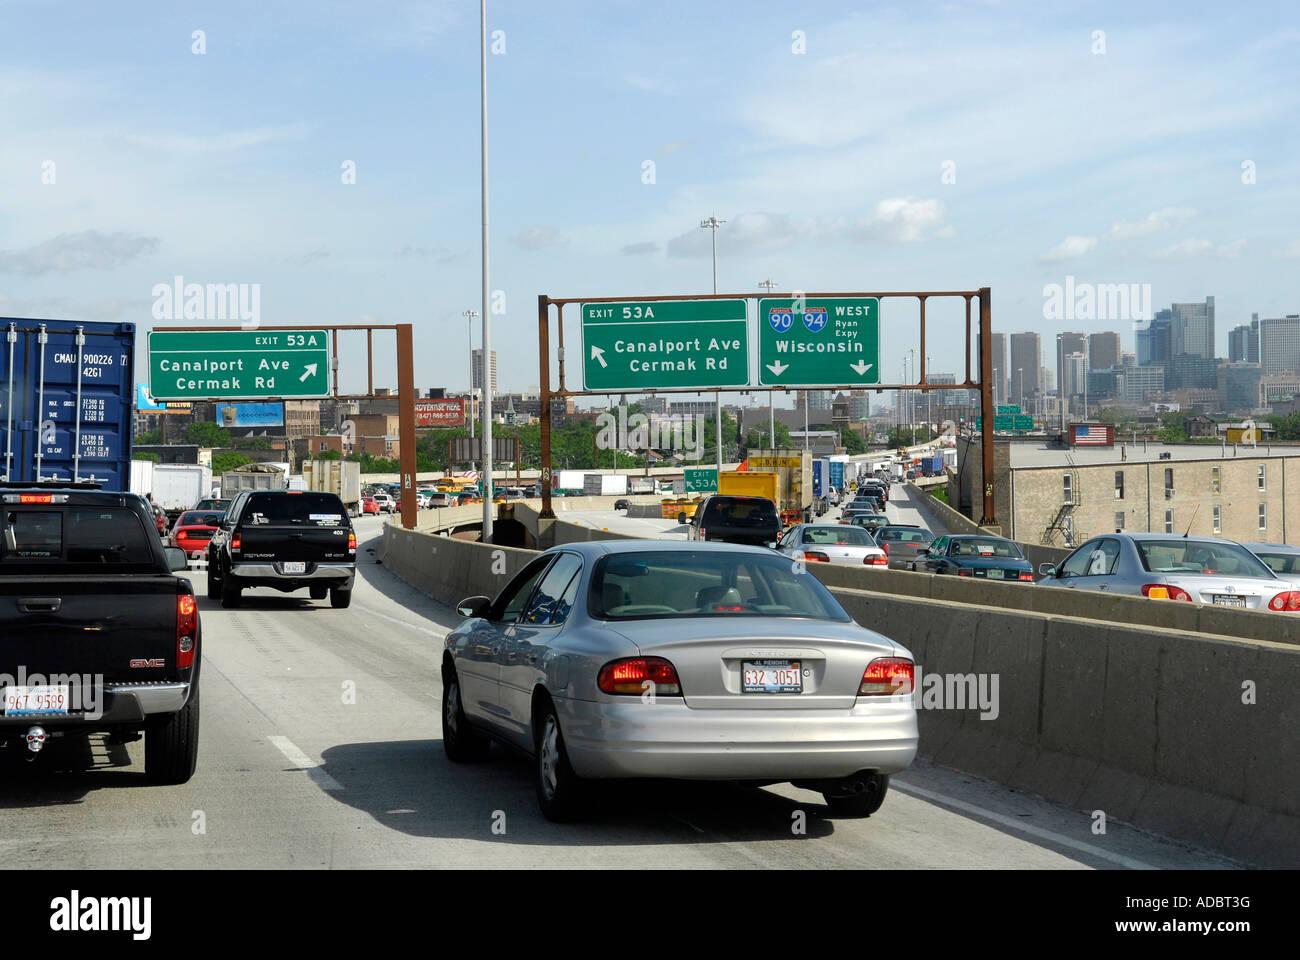 Illinois Chicago Traffic Congestion On Stock Photos